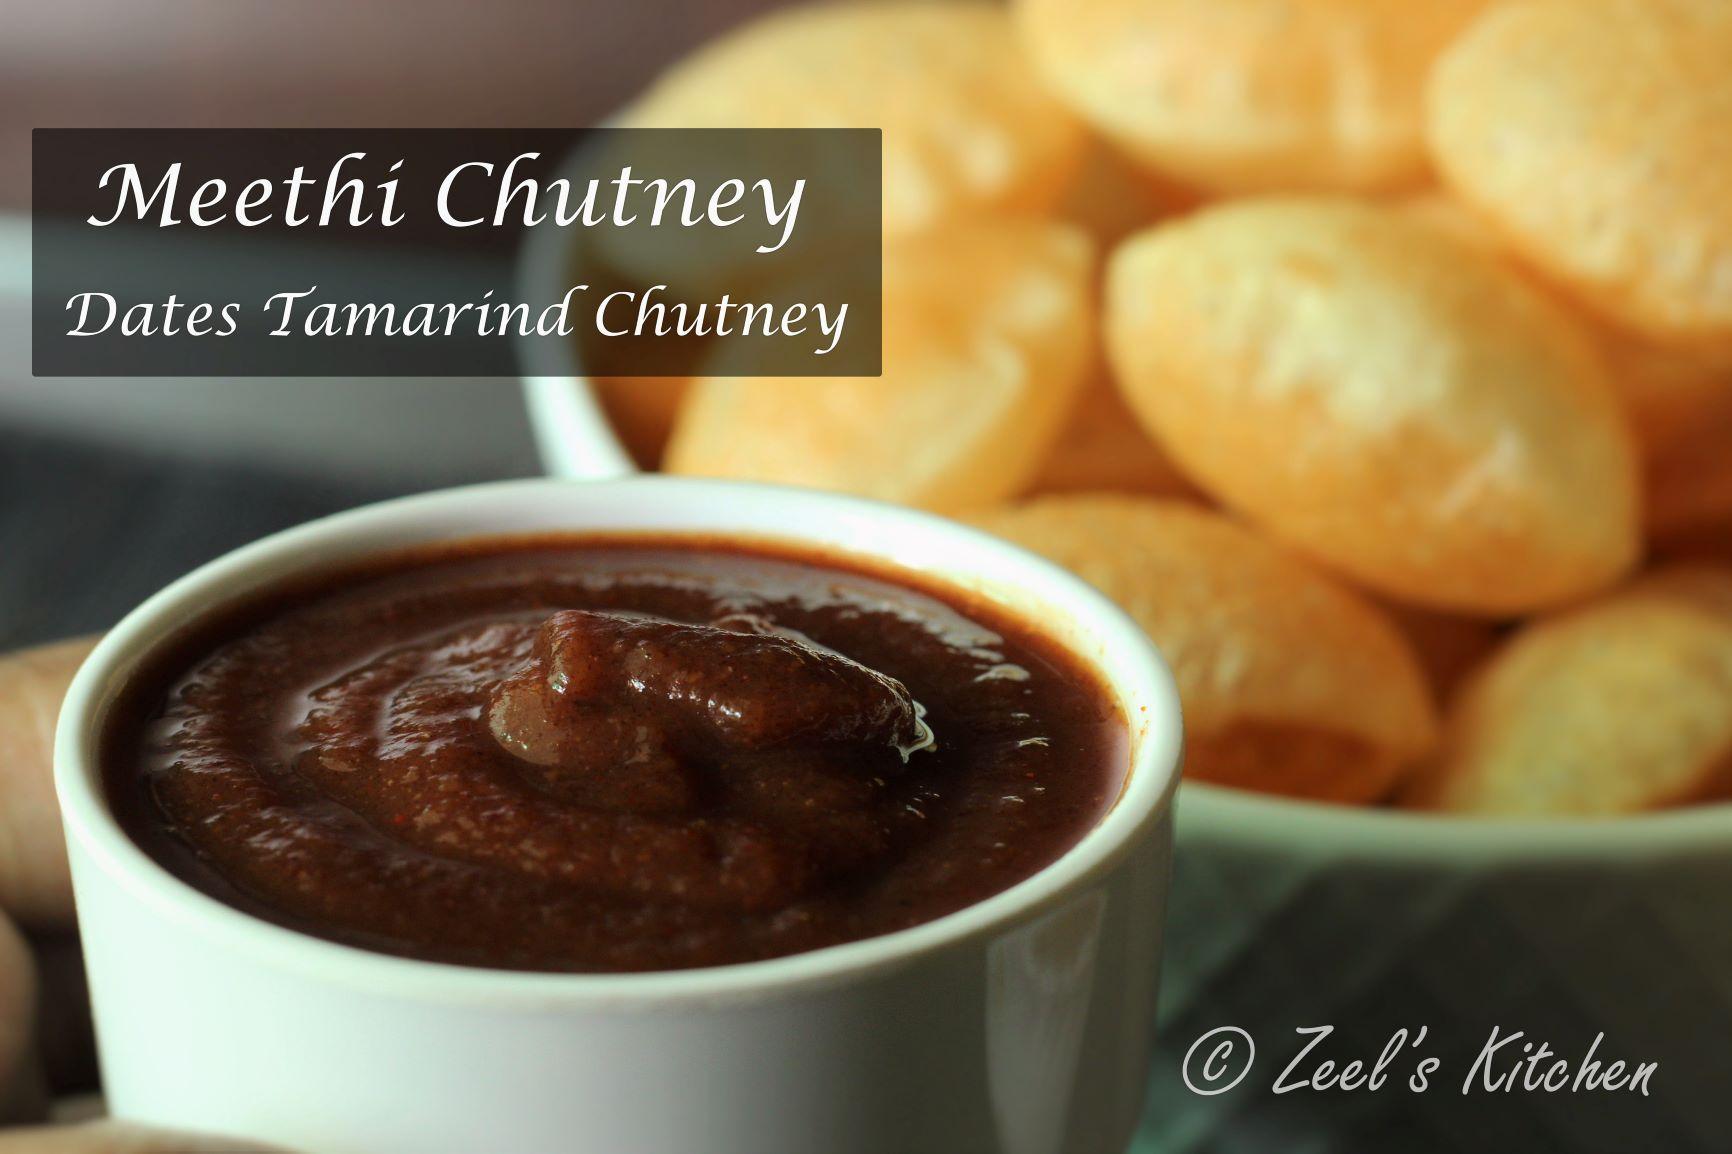 Meethi Chutney | Dates Tamarind Chutney | Imli Khajur Chutney | Indian Sweet and Sour Sauce